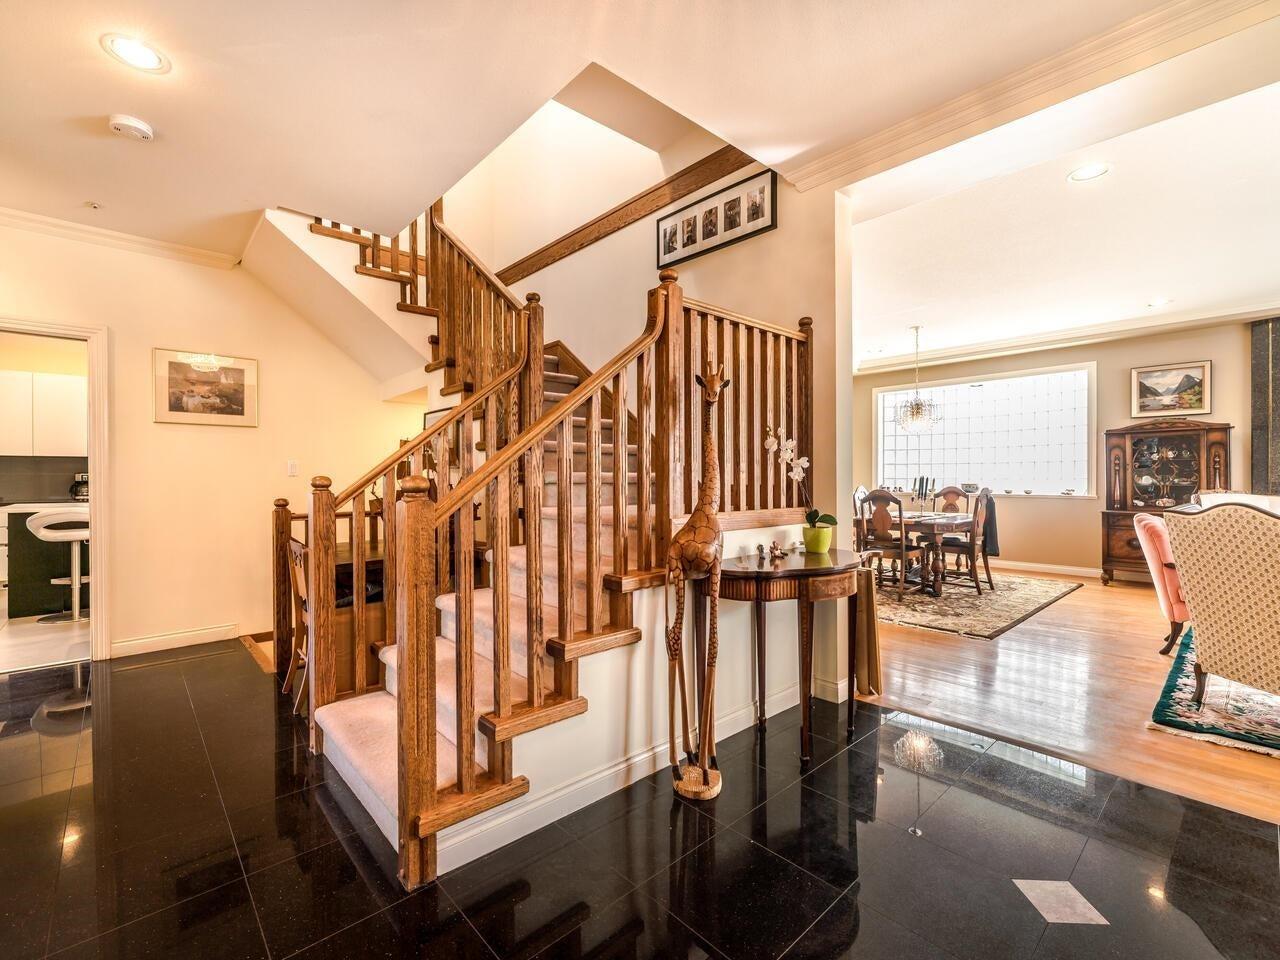 7888 JASPER CRESCENT - Fraserview VE House/Single Family for sale, 7 Bedrooms (R2622945) - #3